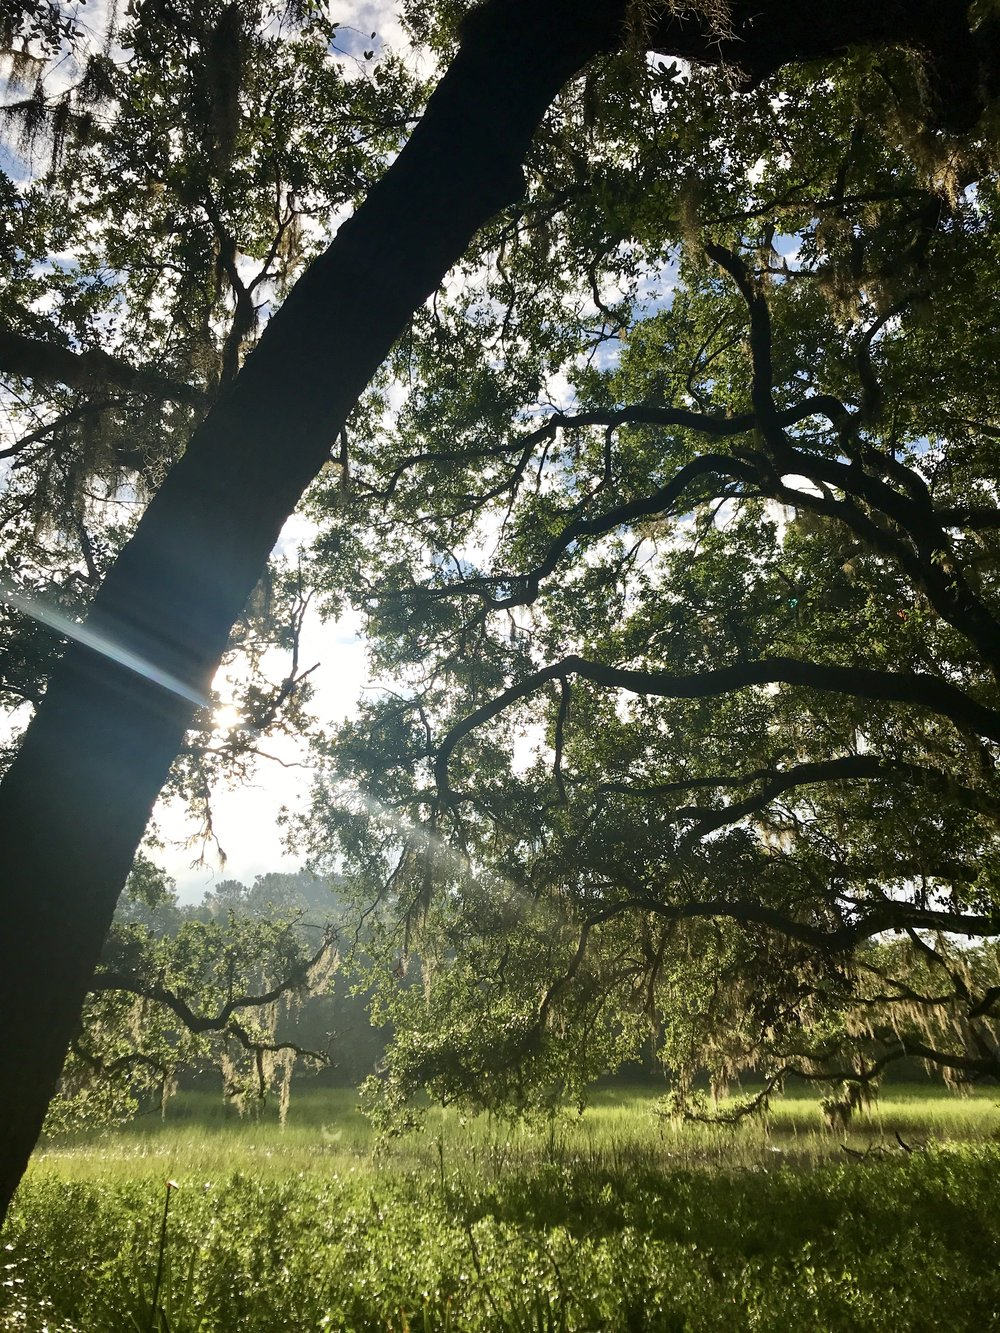 THE CHARLESTON TREEHOUSE